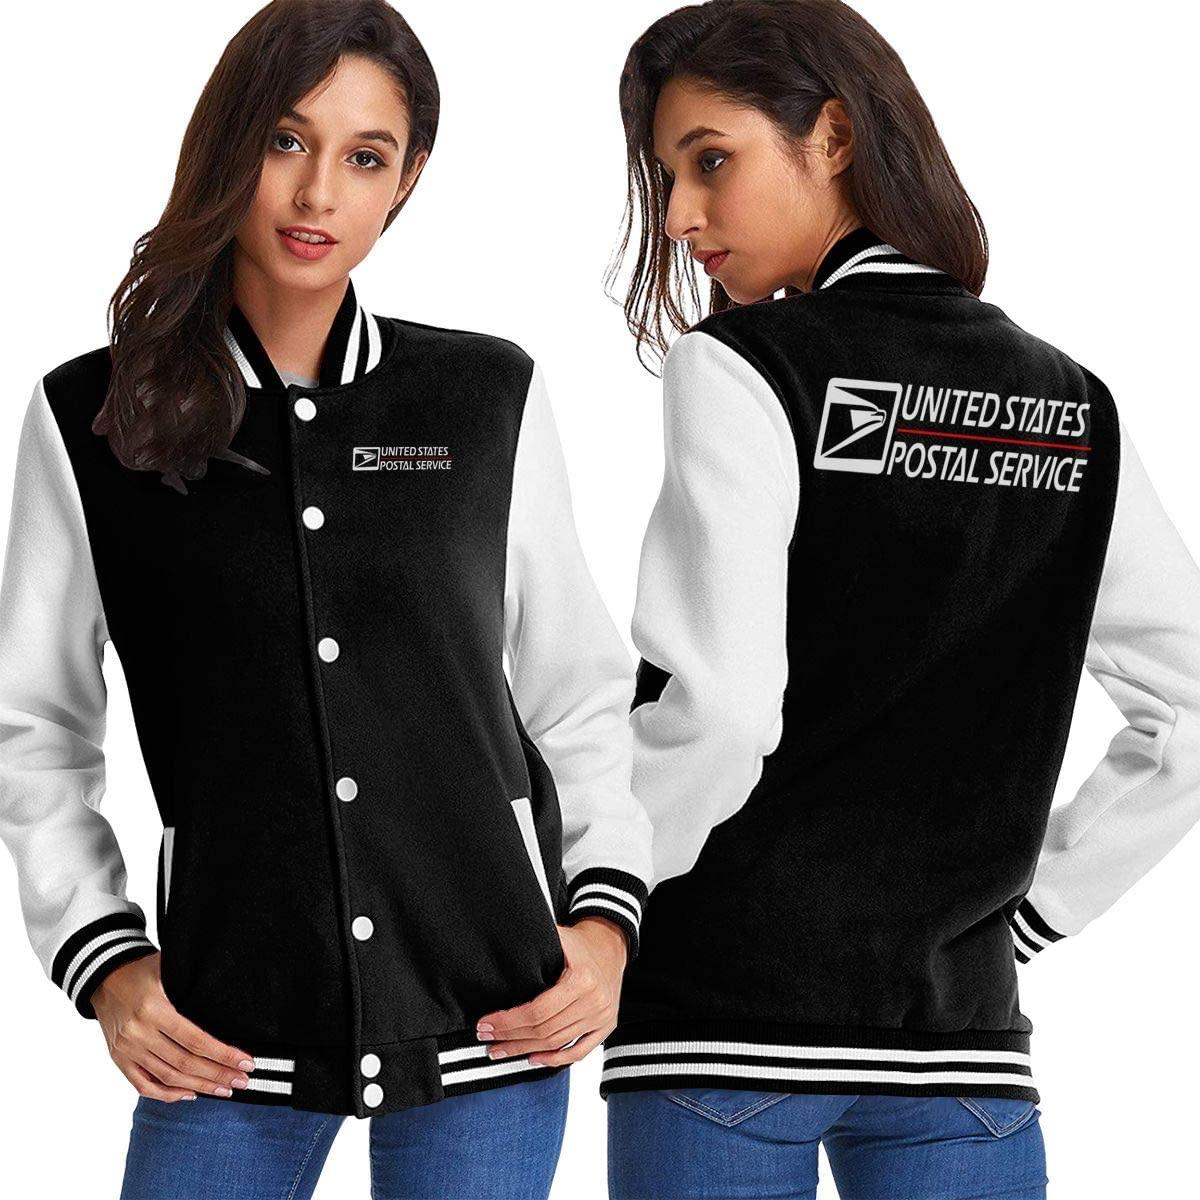 United States Postal Services Womens Sport Baseball Uniform Jacket Coat Adult Coat